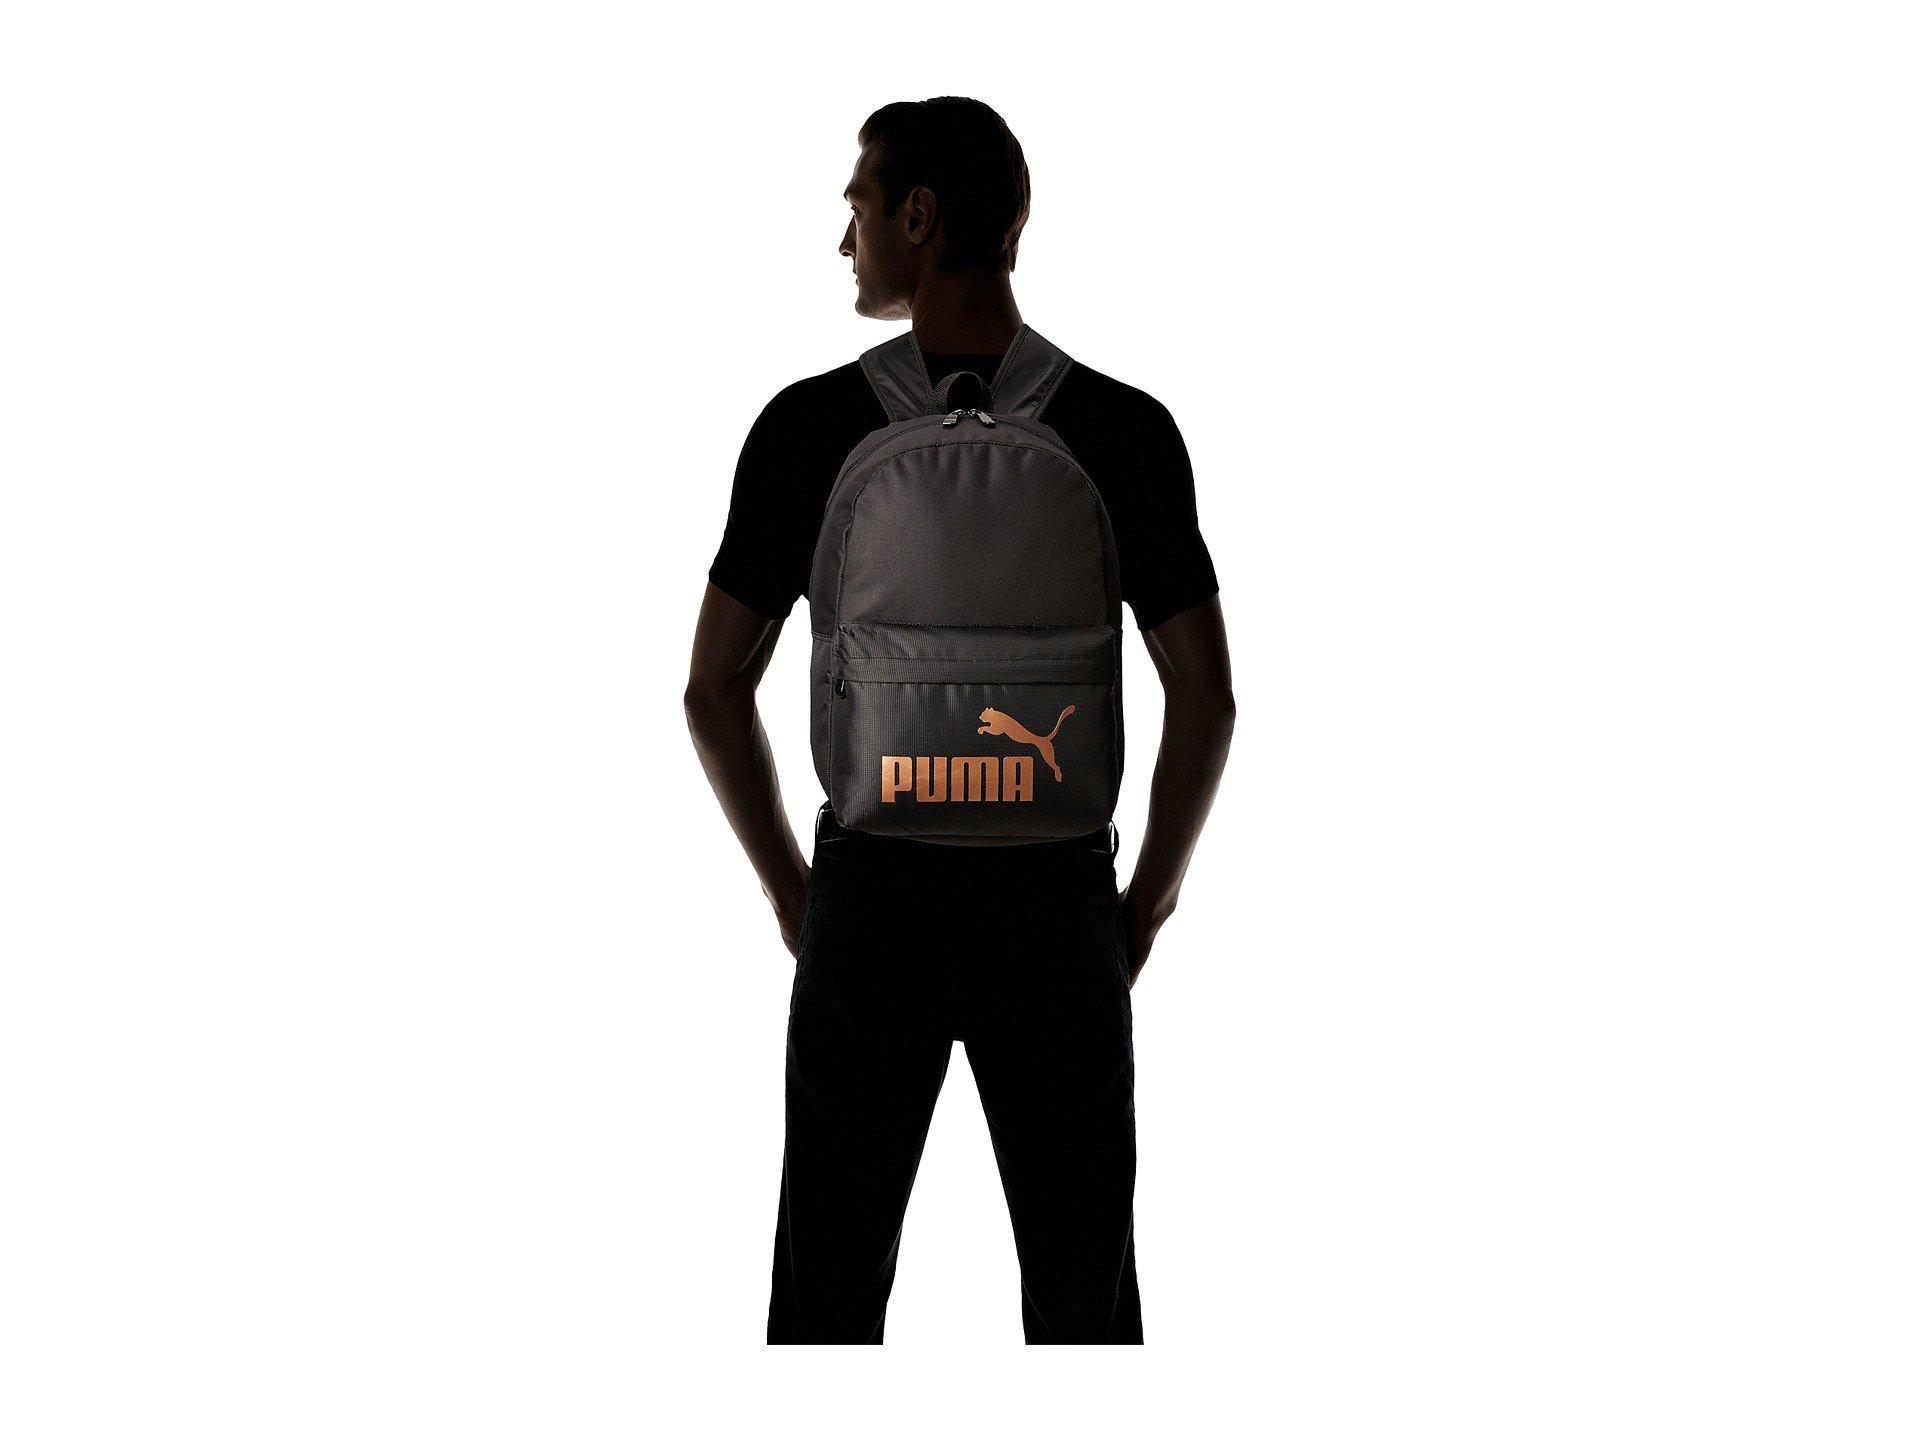 207270394d ... half price Lyst - Puma Evercat Lifeline Backpack in Black for Men f35f8  9809b ...